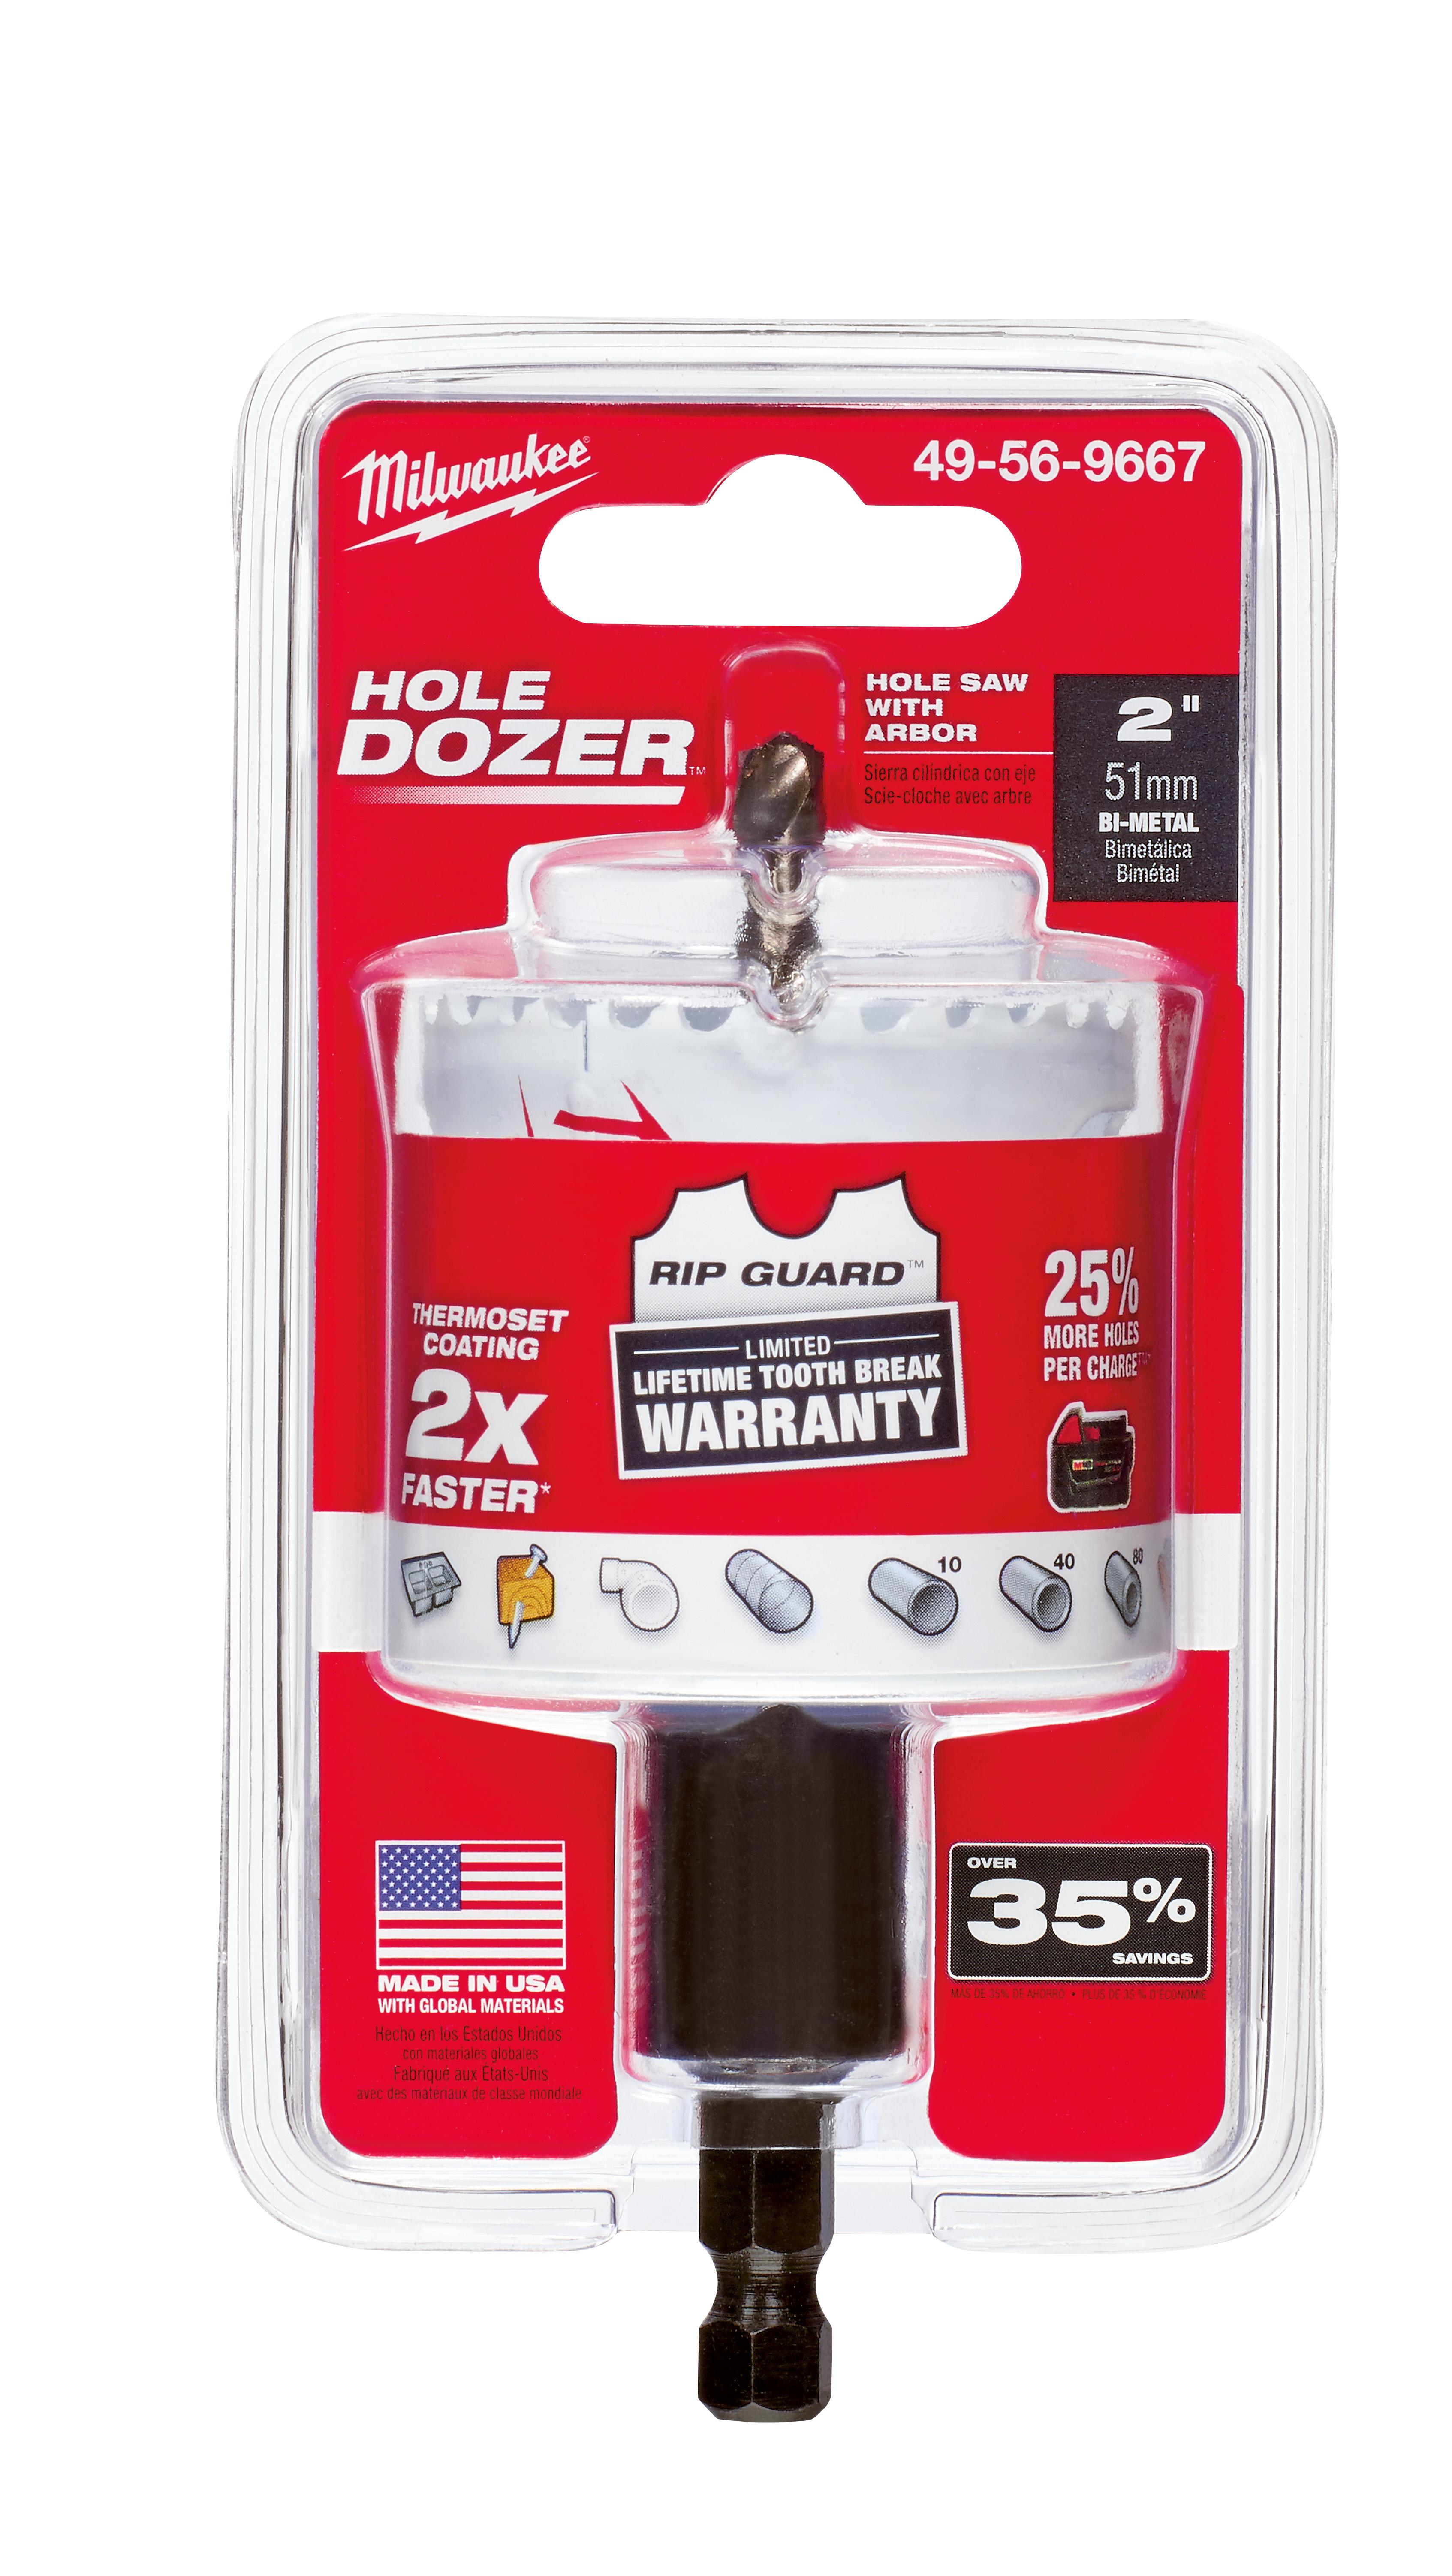 Milwaukee® 49-56-9667 Hole Dozer™ 49-56 Hole Saw, 2 in Dia, 1-5/8 in D Cutting, Bi-Metal/8% Cobalt Cutting Edge